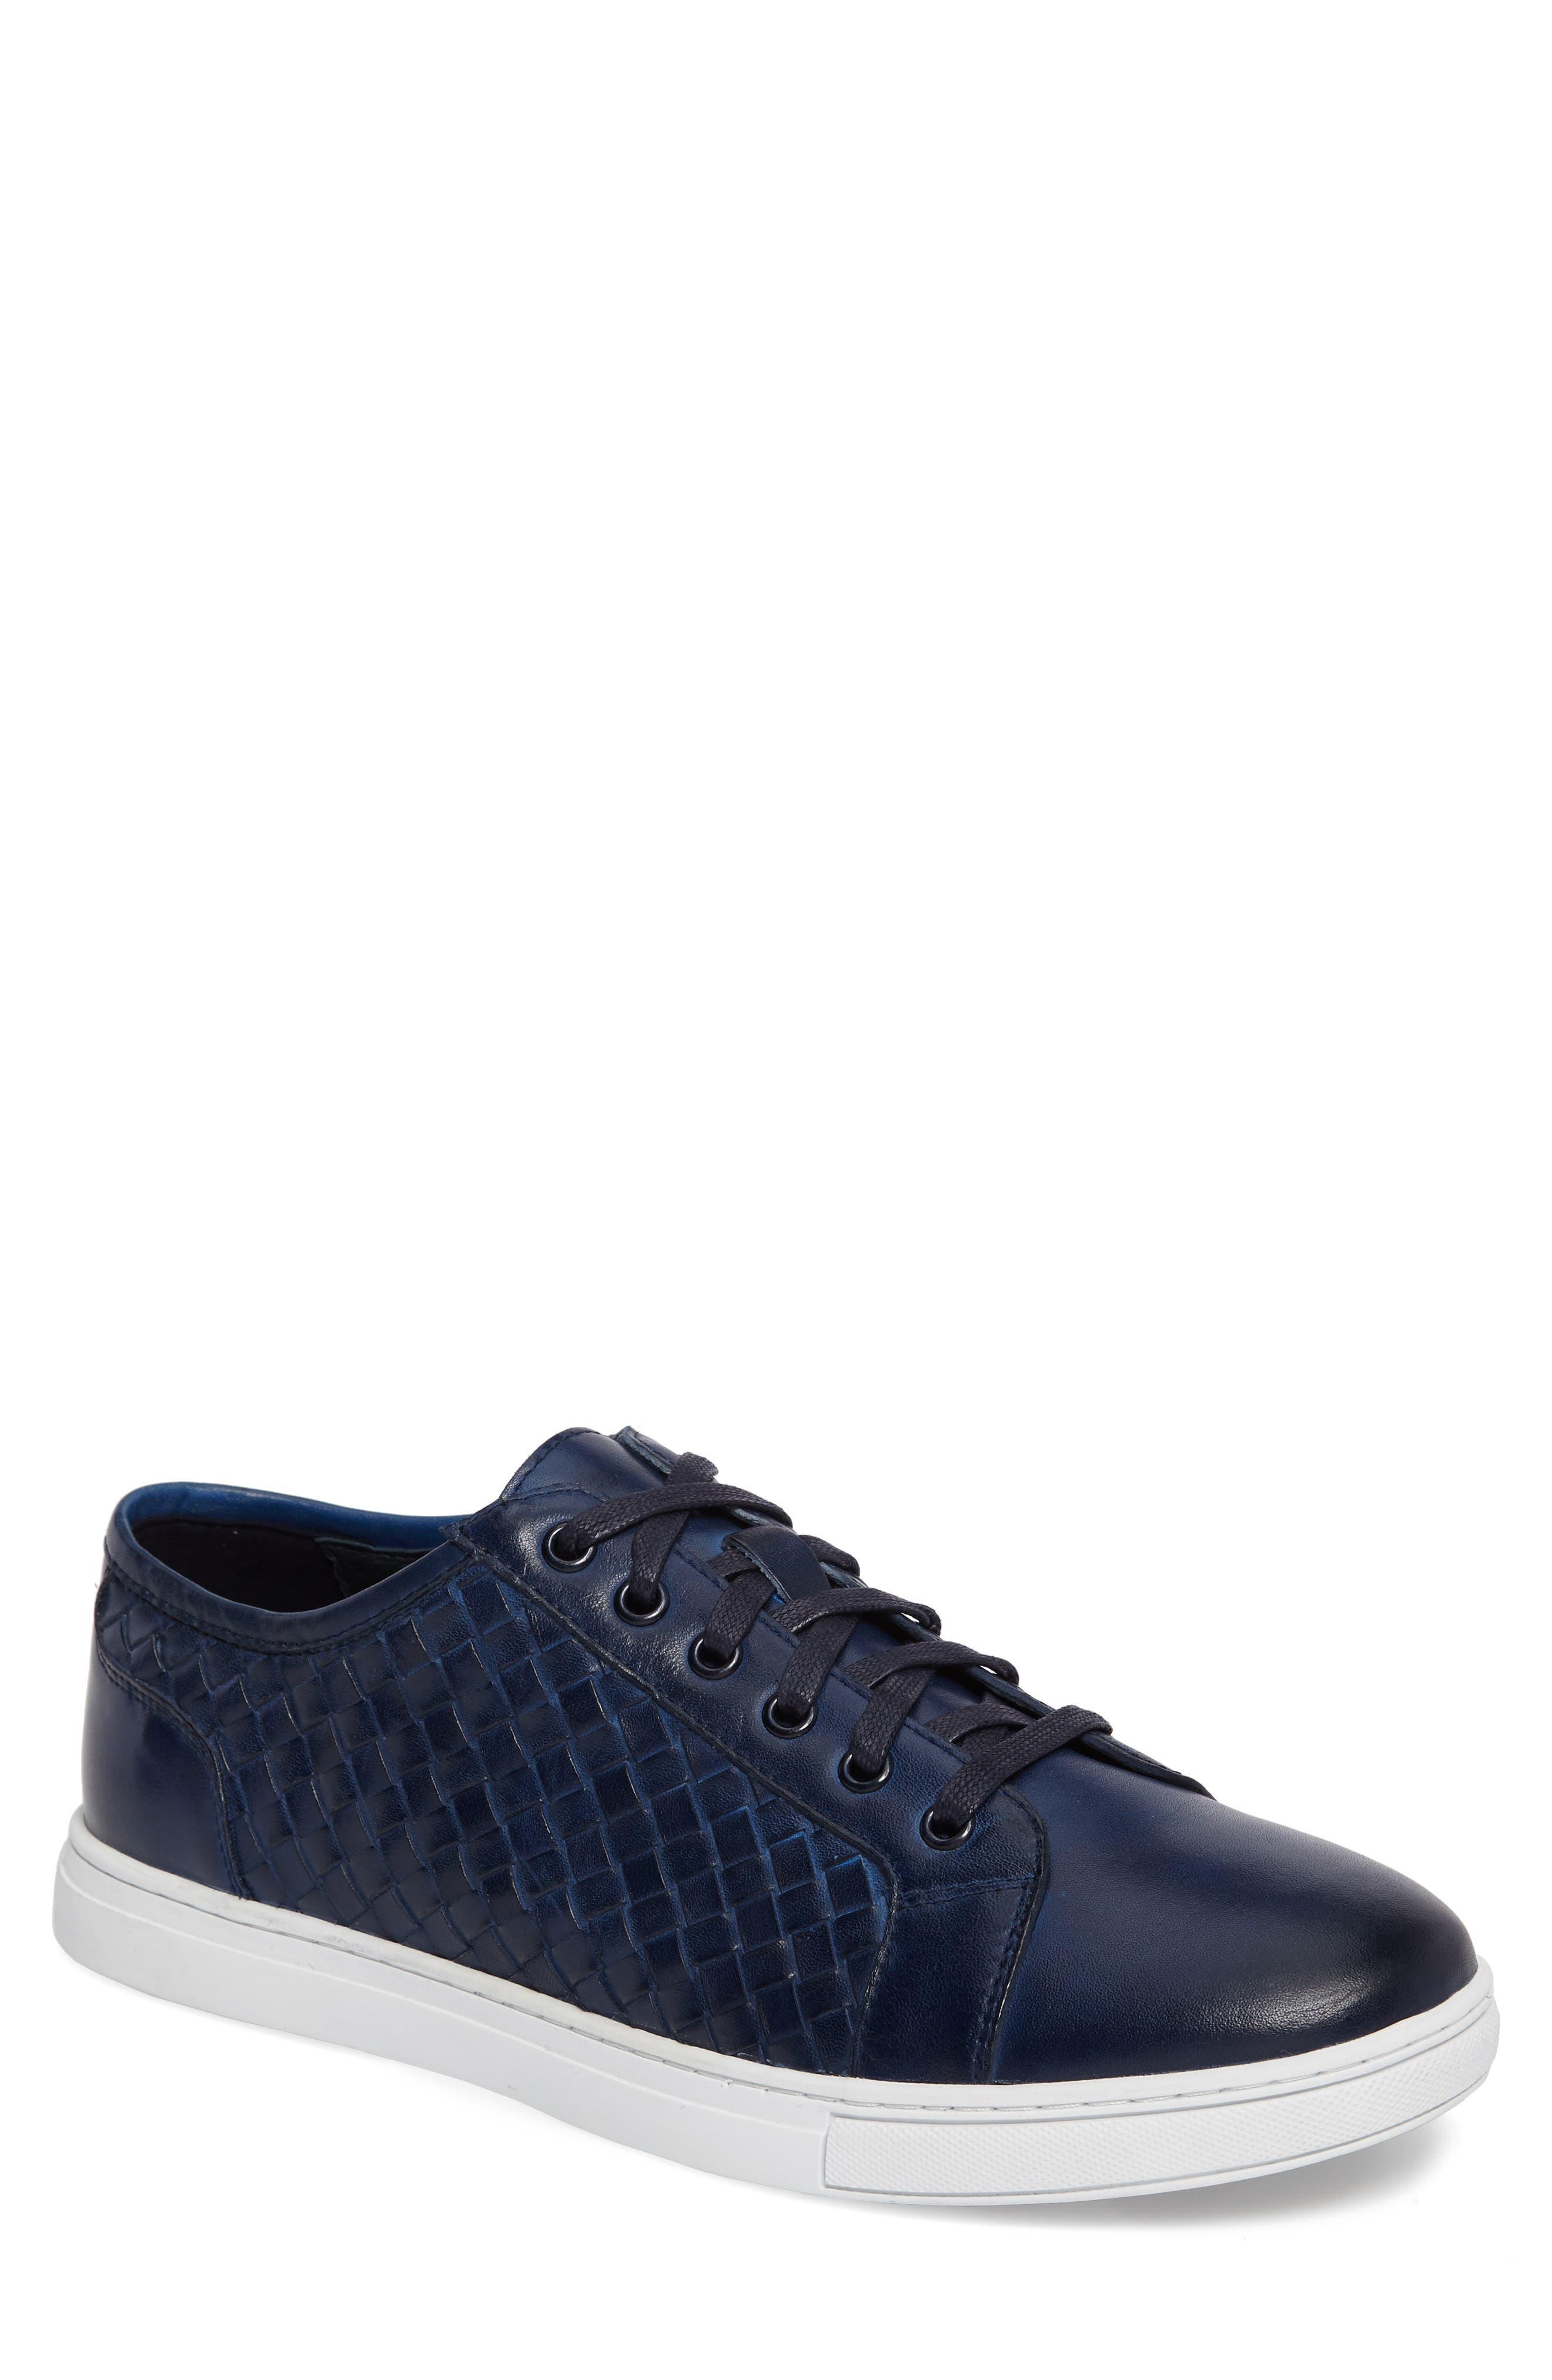 Zanzara Fader Sneaker (Men)